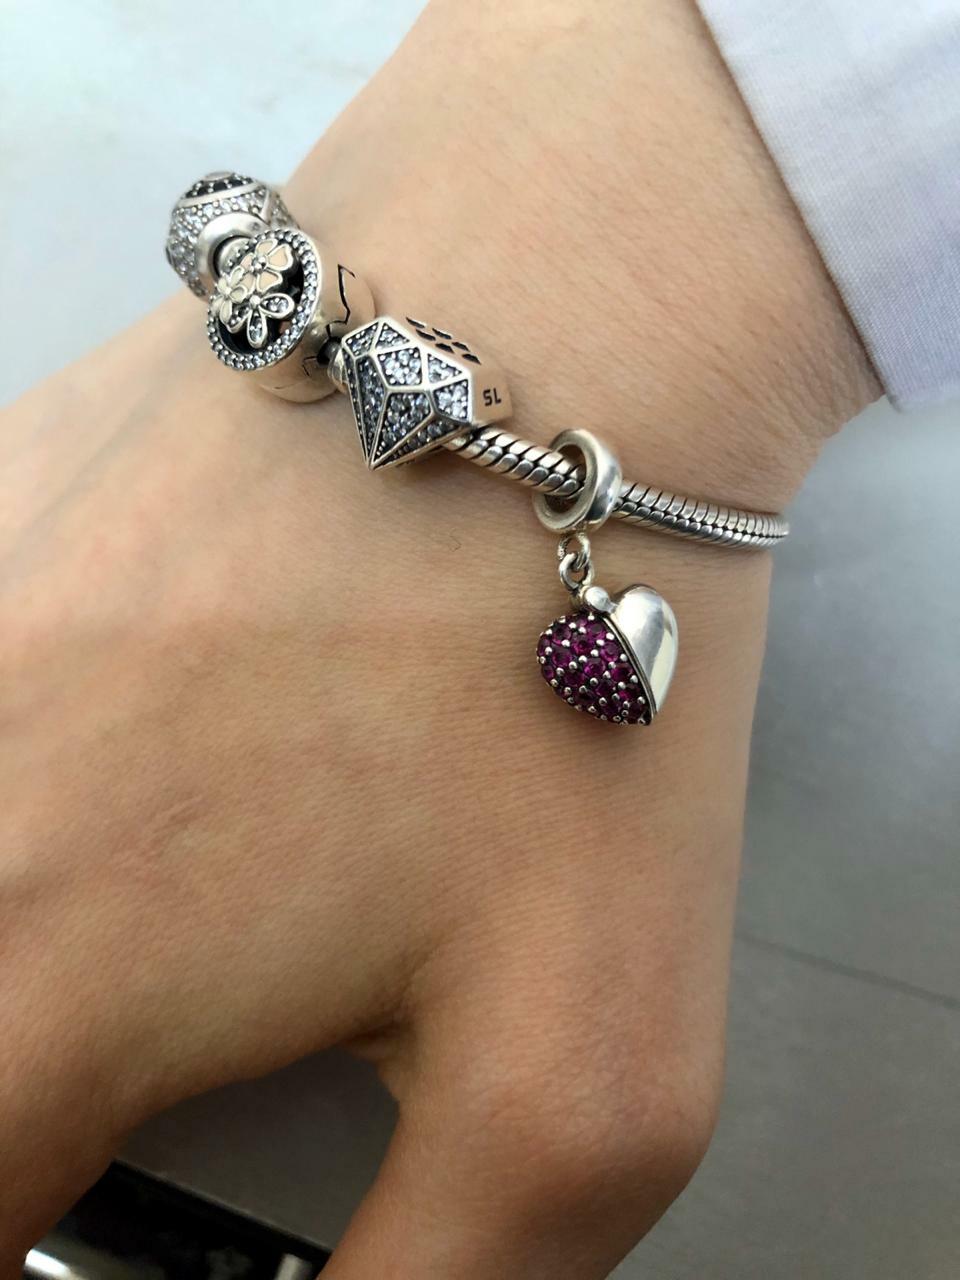 Серебряная подвеска в виде бриллианта